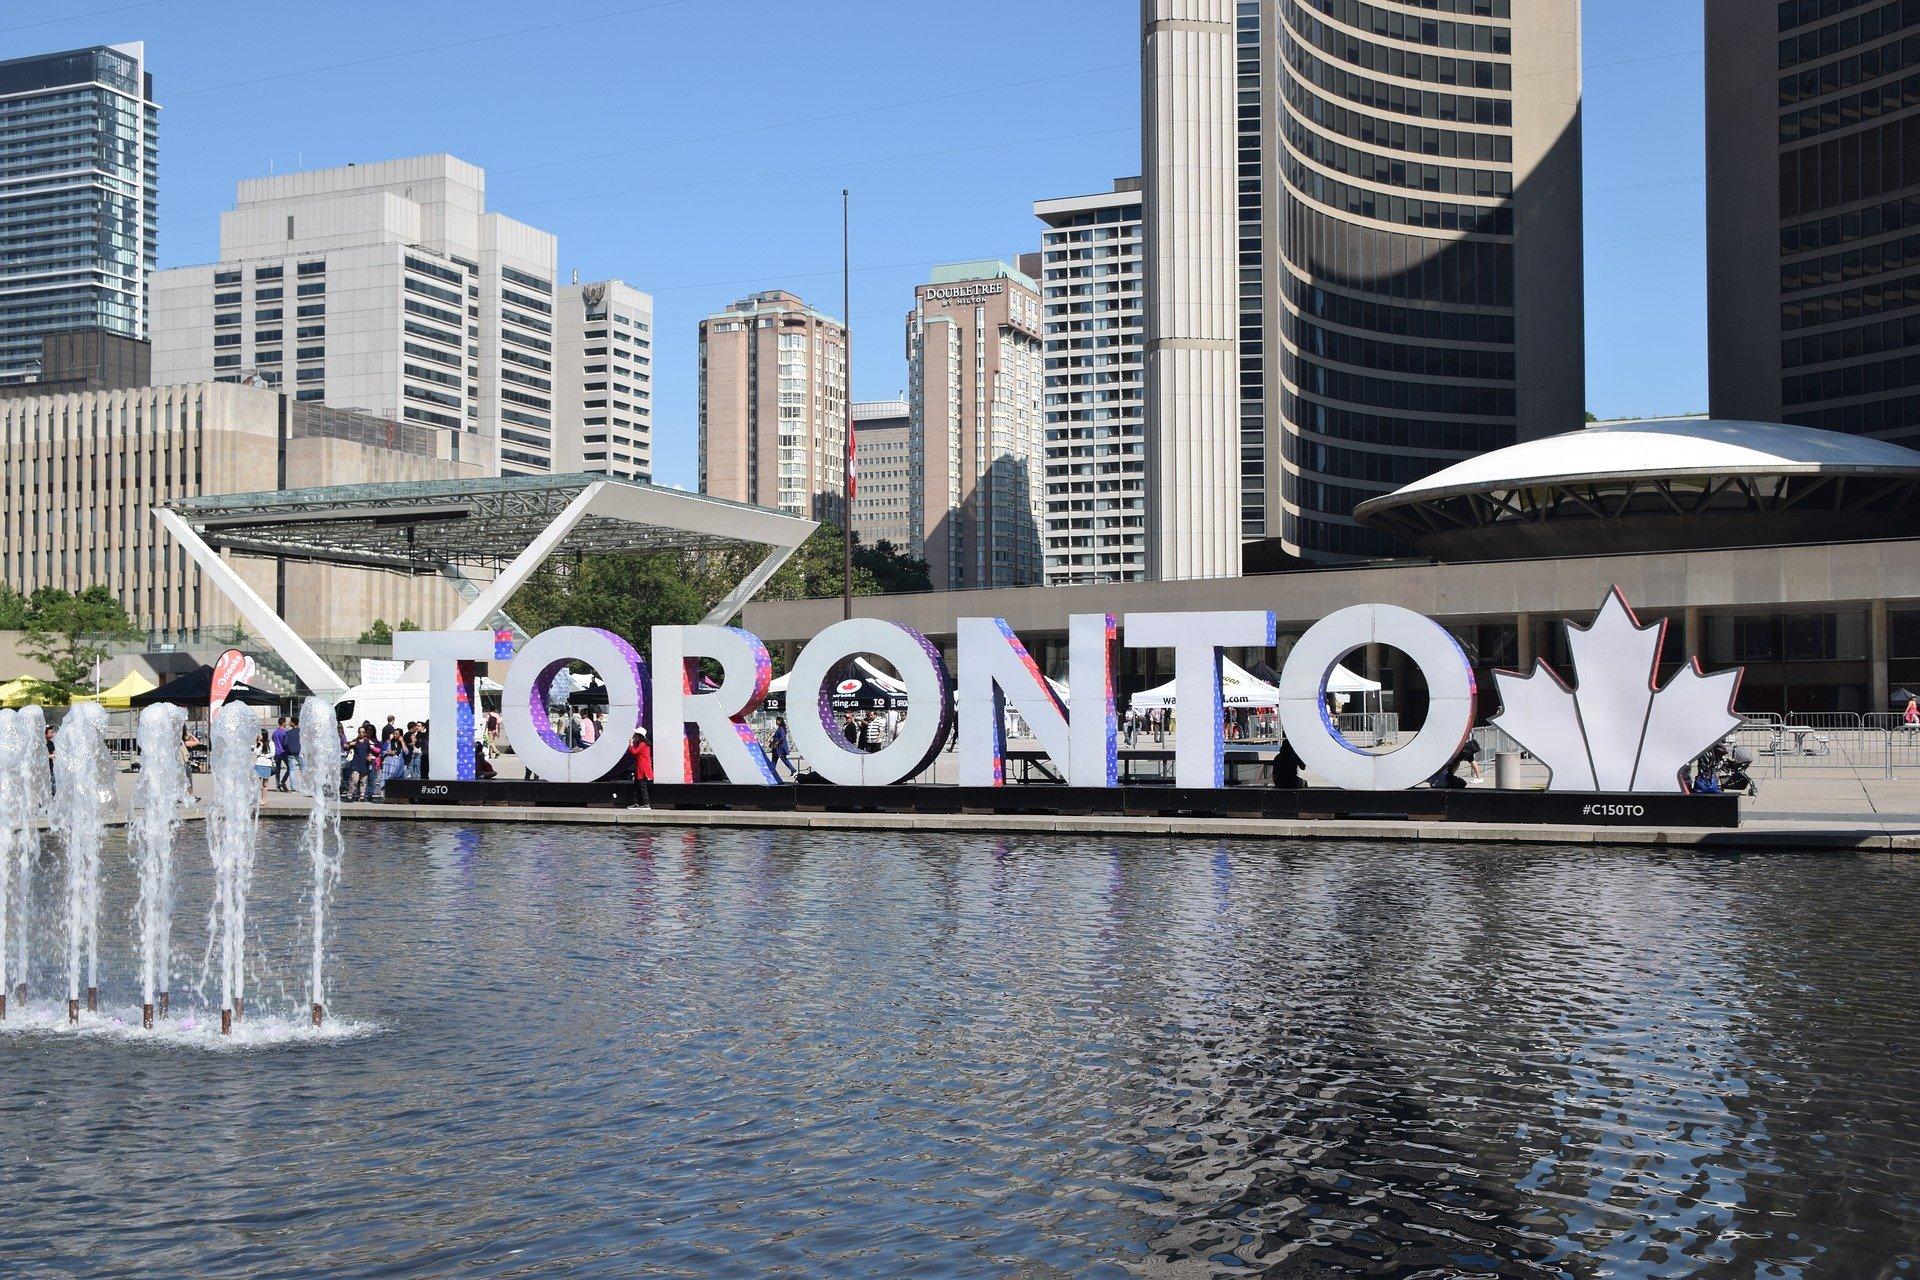 Toronto sign by City Hall